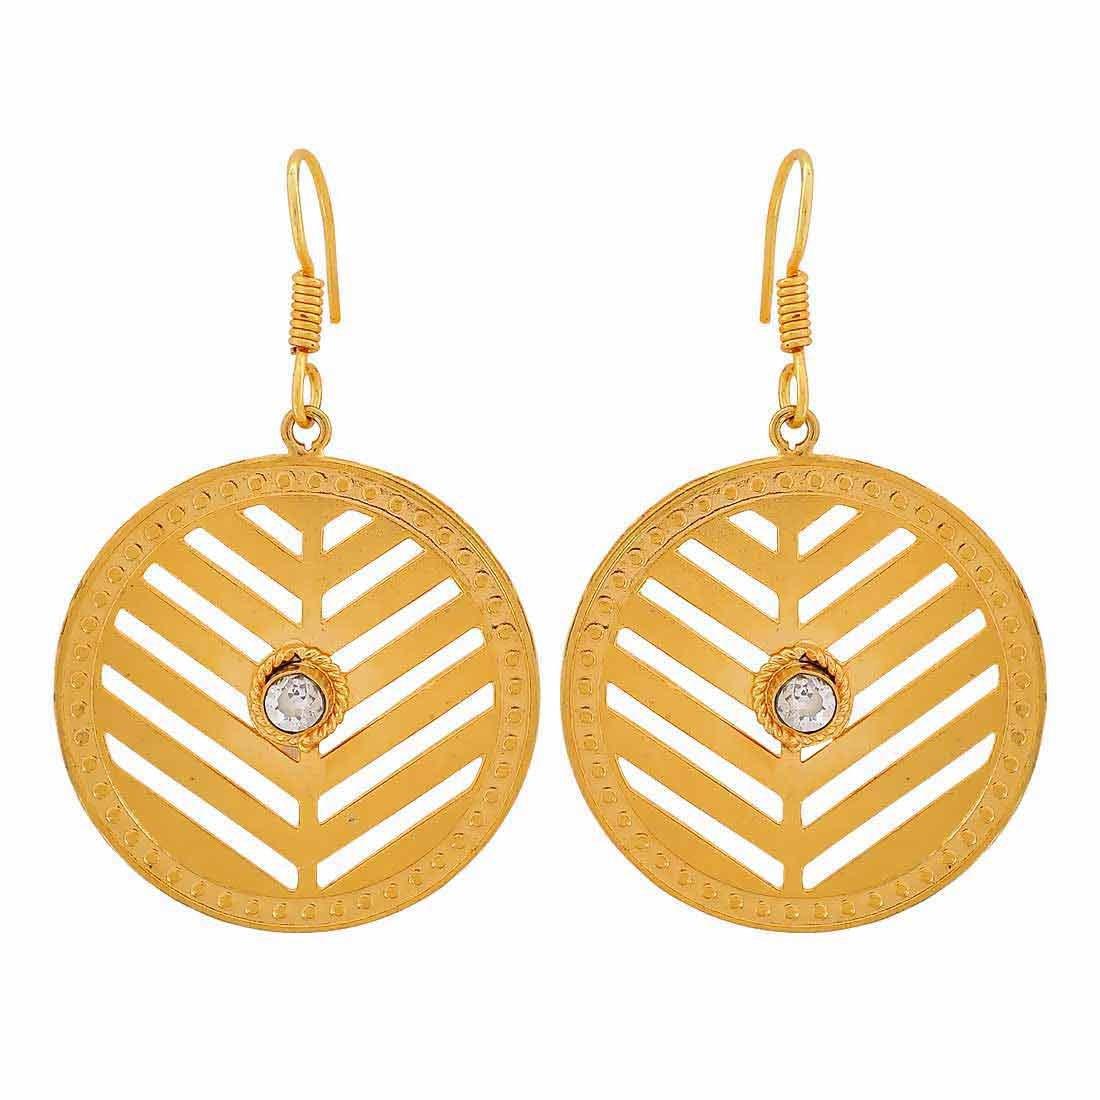 Maayra Filigree Earrings Golden Dangler Drop Dailywear Jewellery